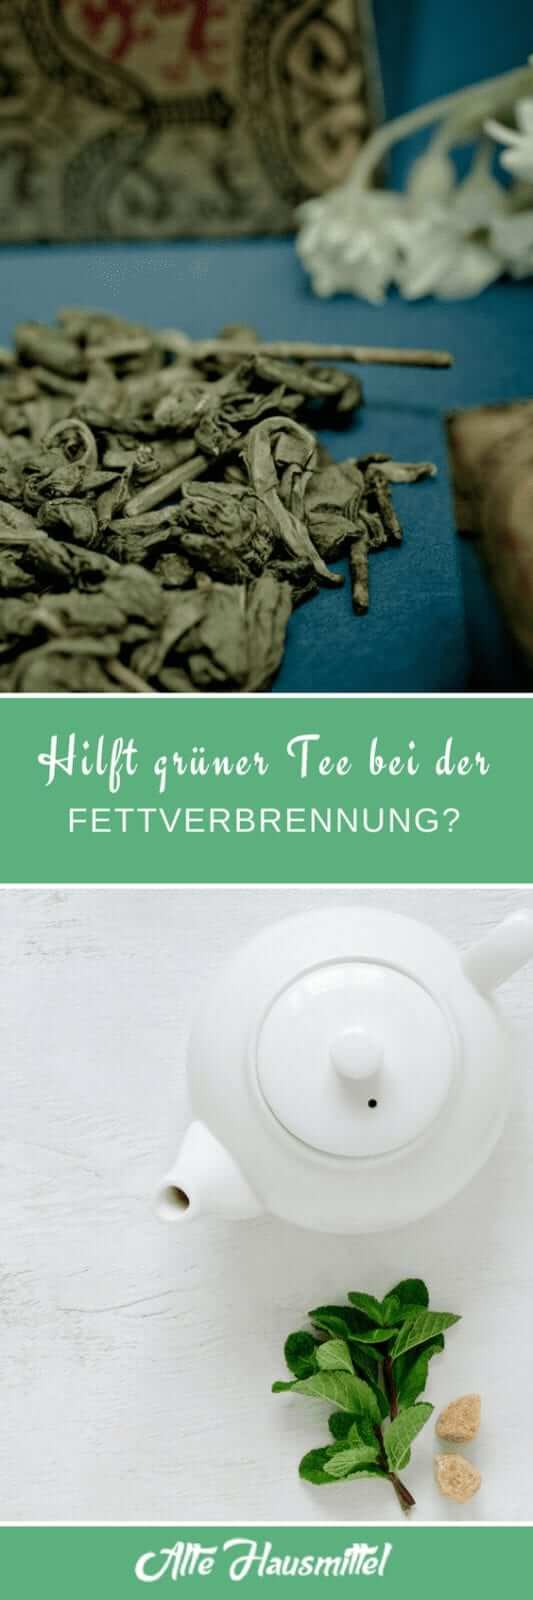 Hilft grüner Tee bei der Fettverbrennung?